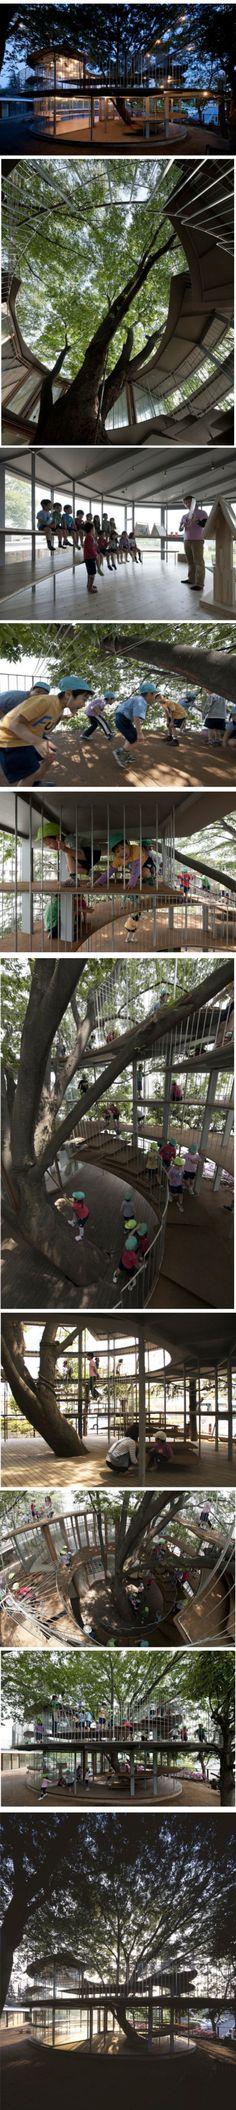 An inventive and ingenious kindergarten design centred around a tree!!!